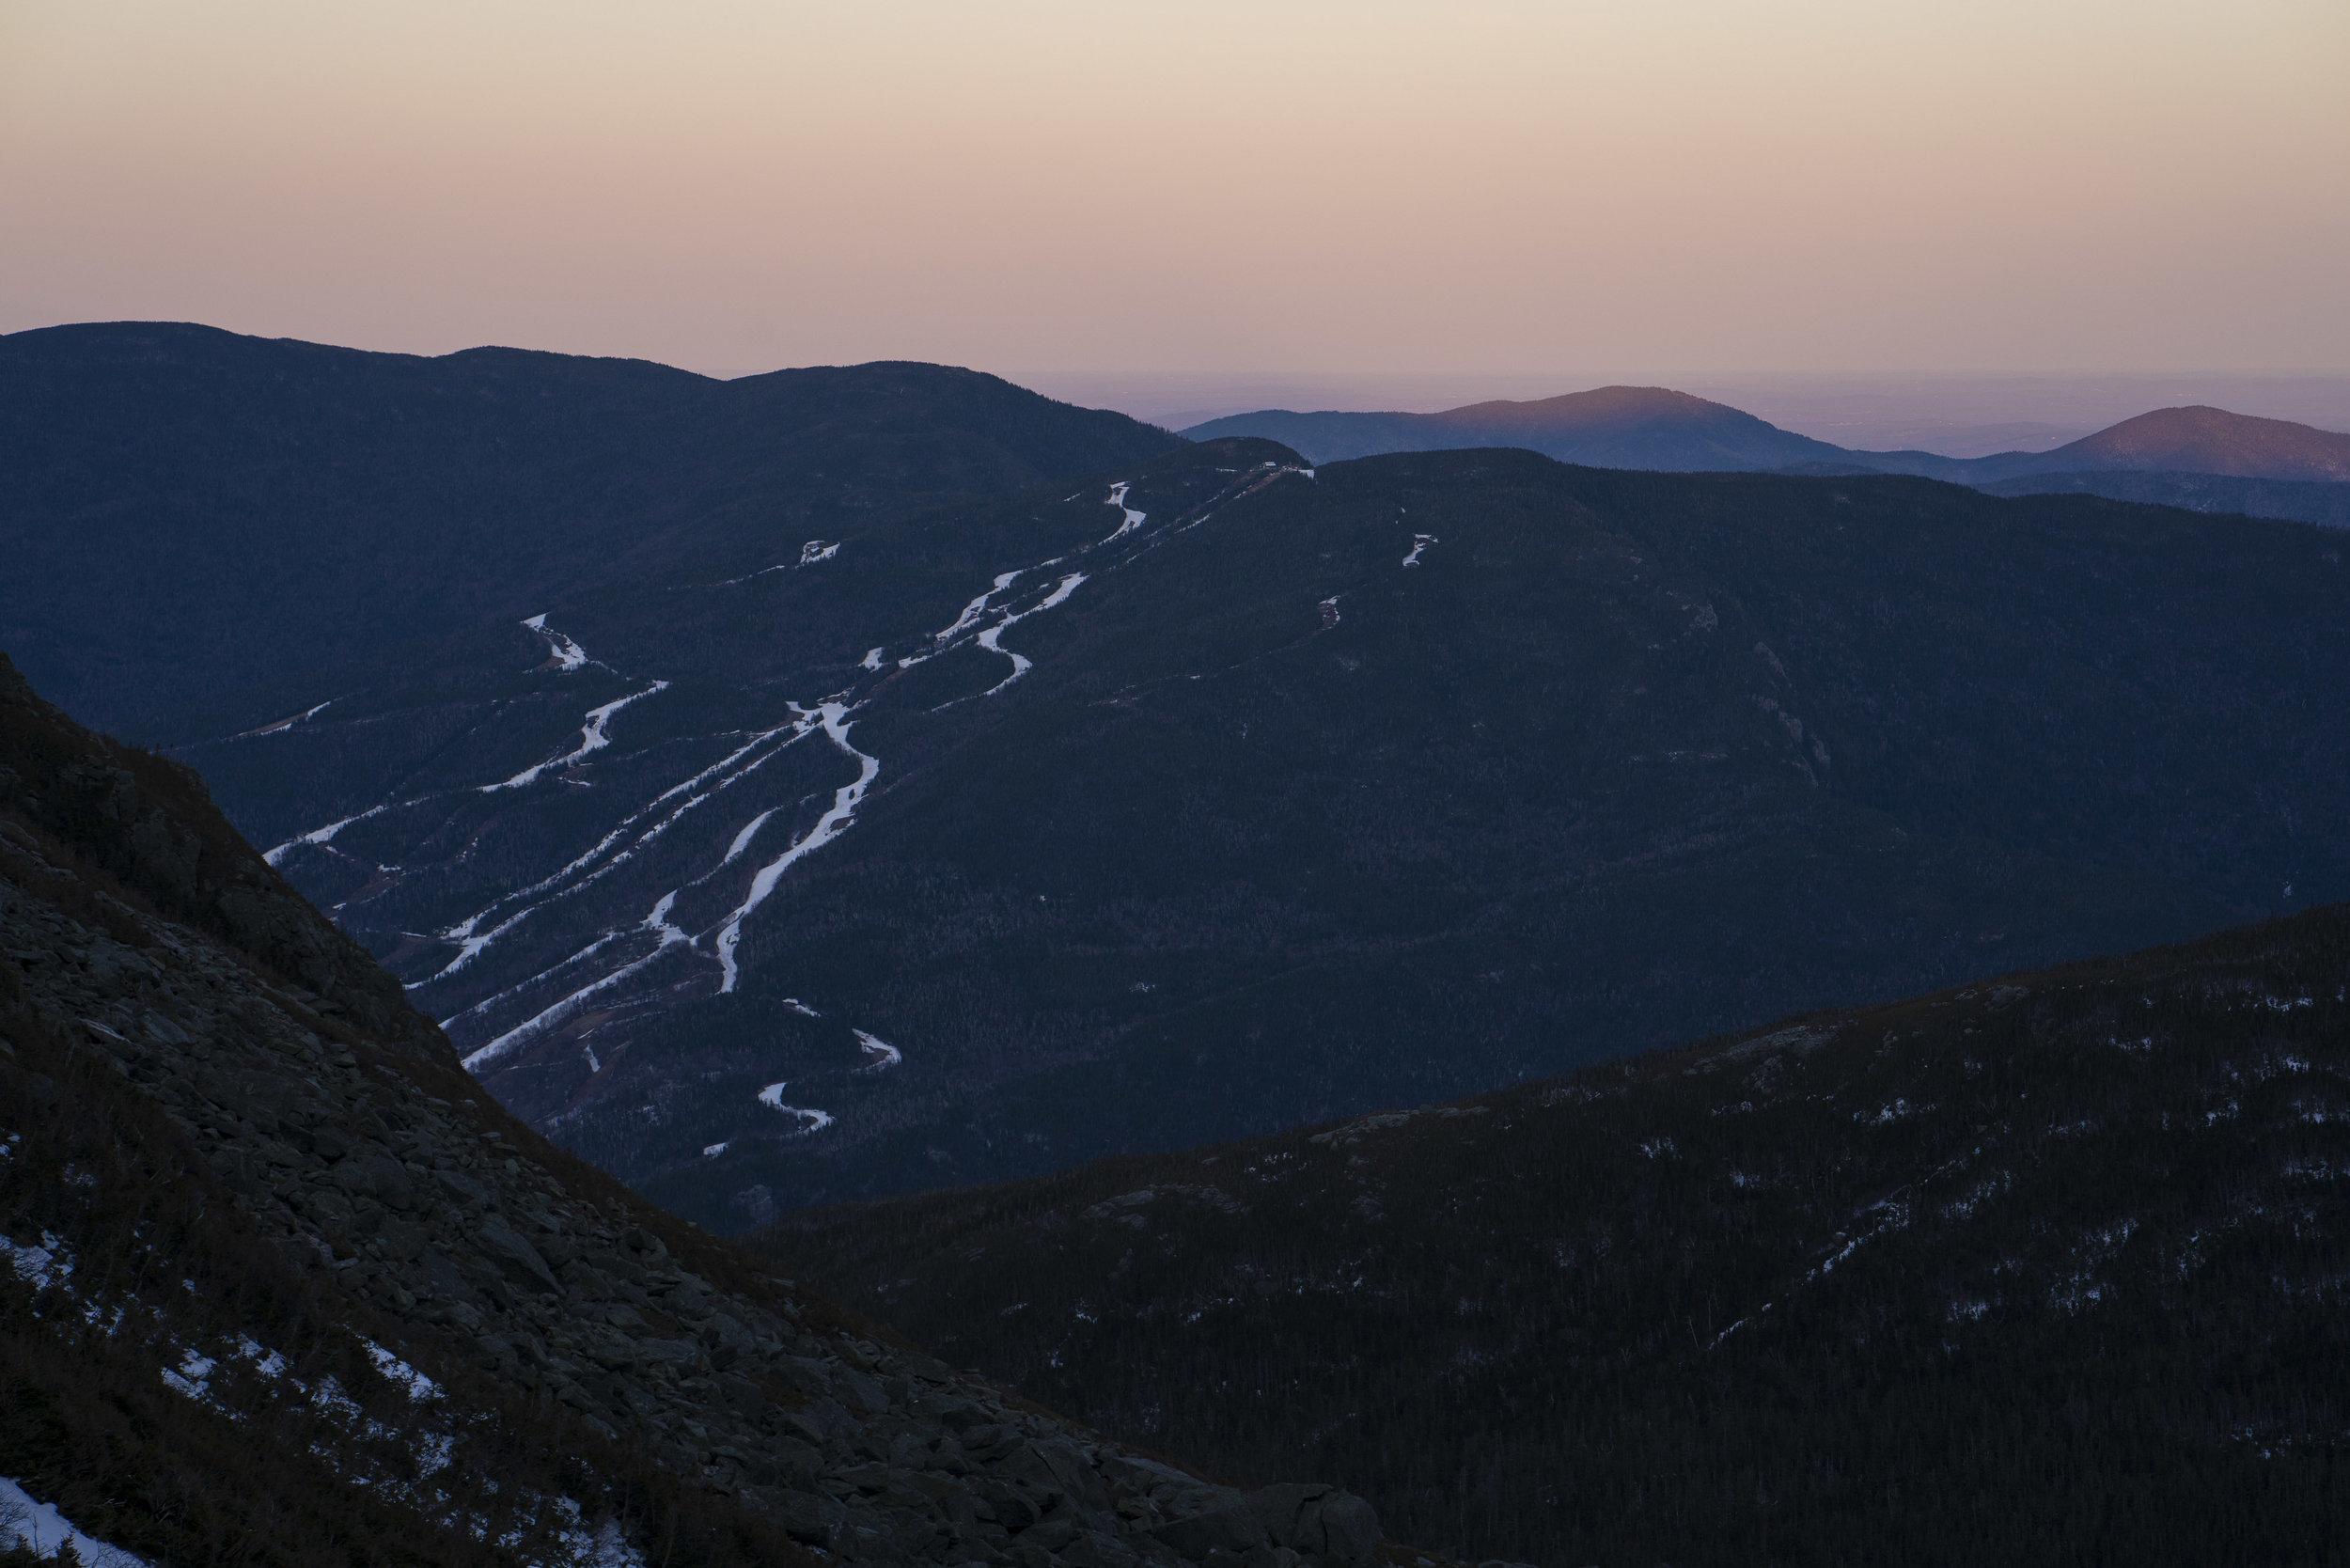 Wildcat Ski Area at Sunset